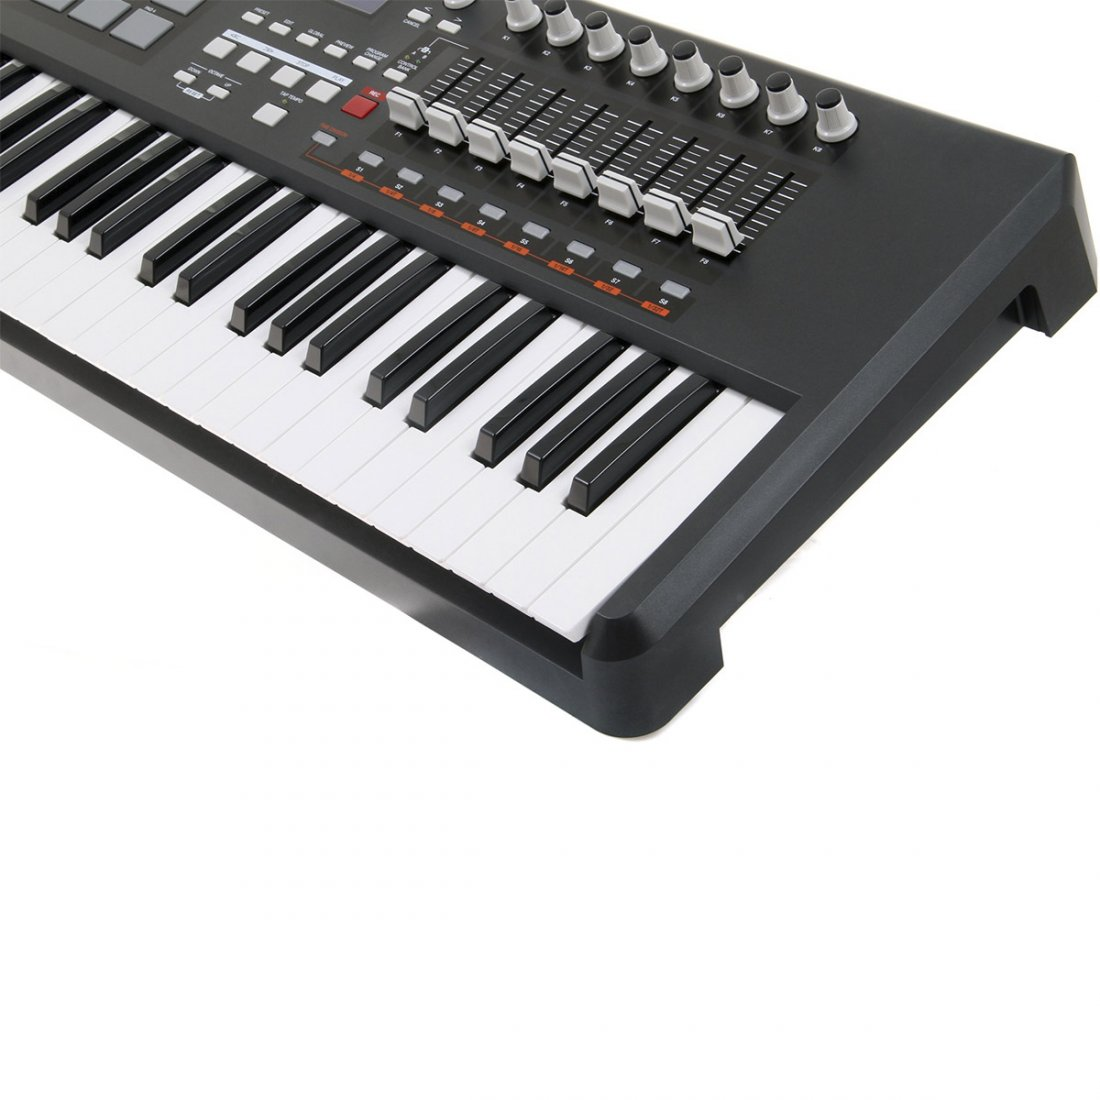 Akai MPK61 Teclado Controlador Midi, Bivolt